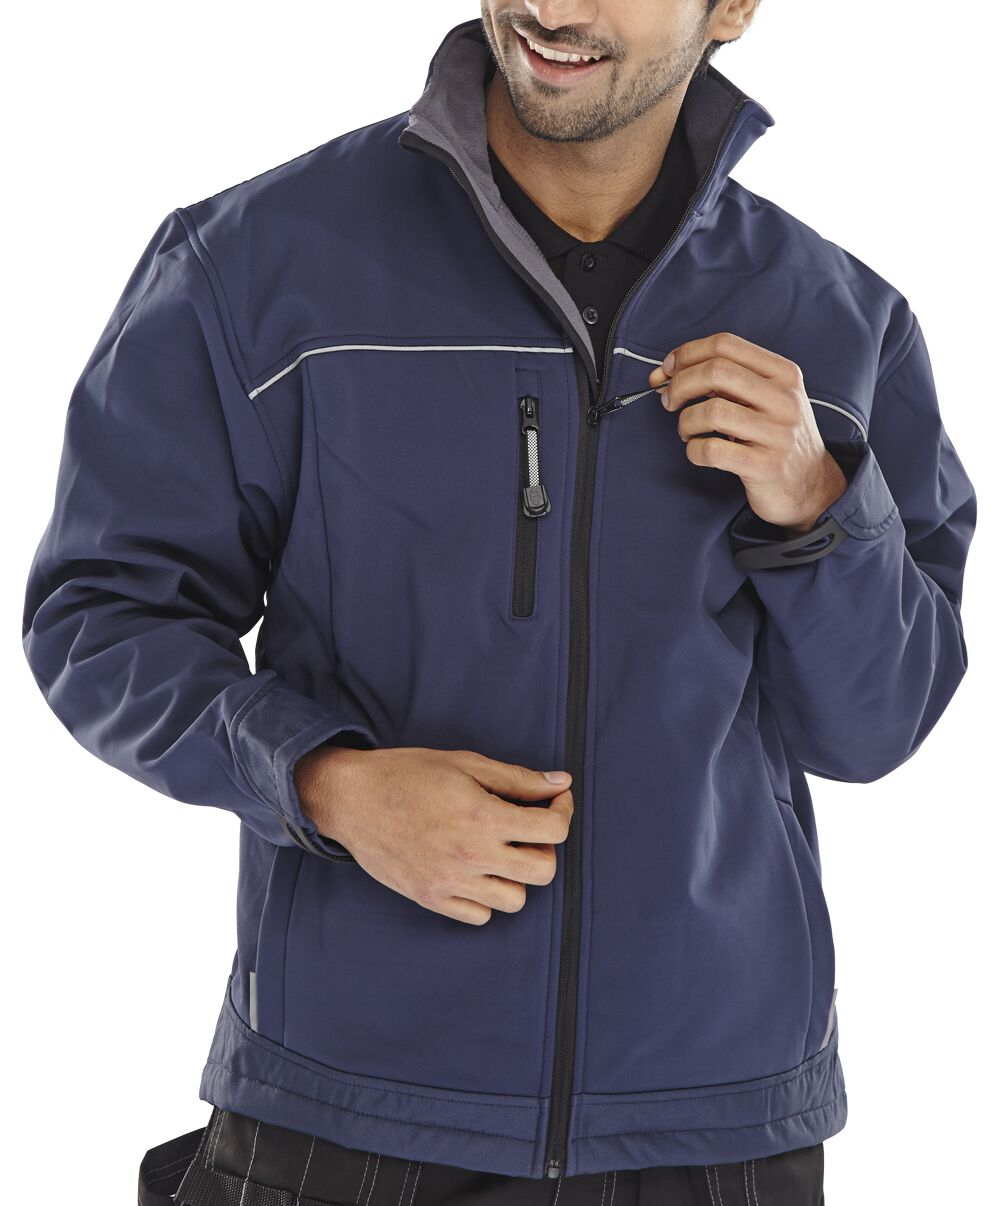 Poly-Cotton Workwear - Soft Shell Jacket Navy Xs